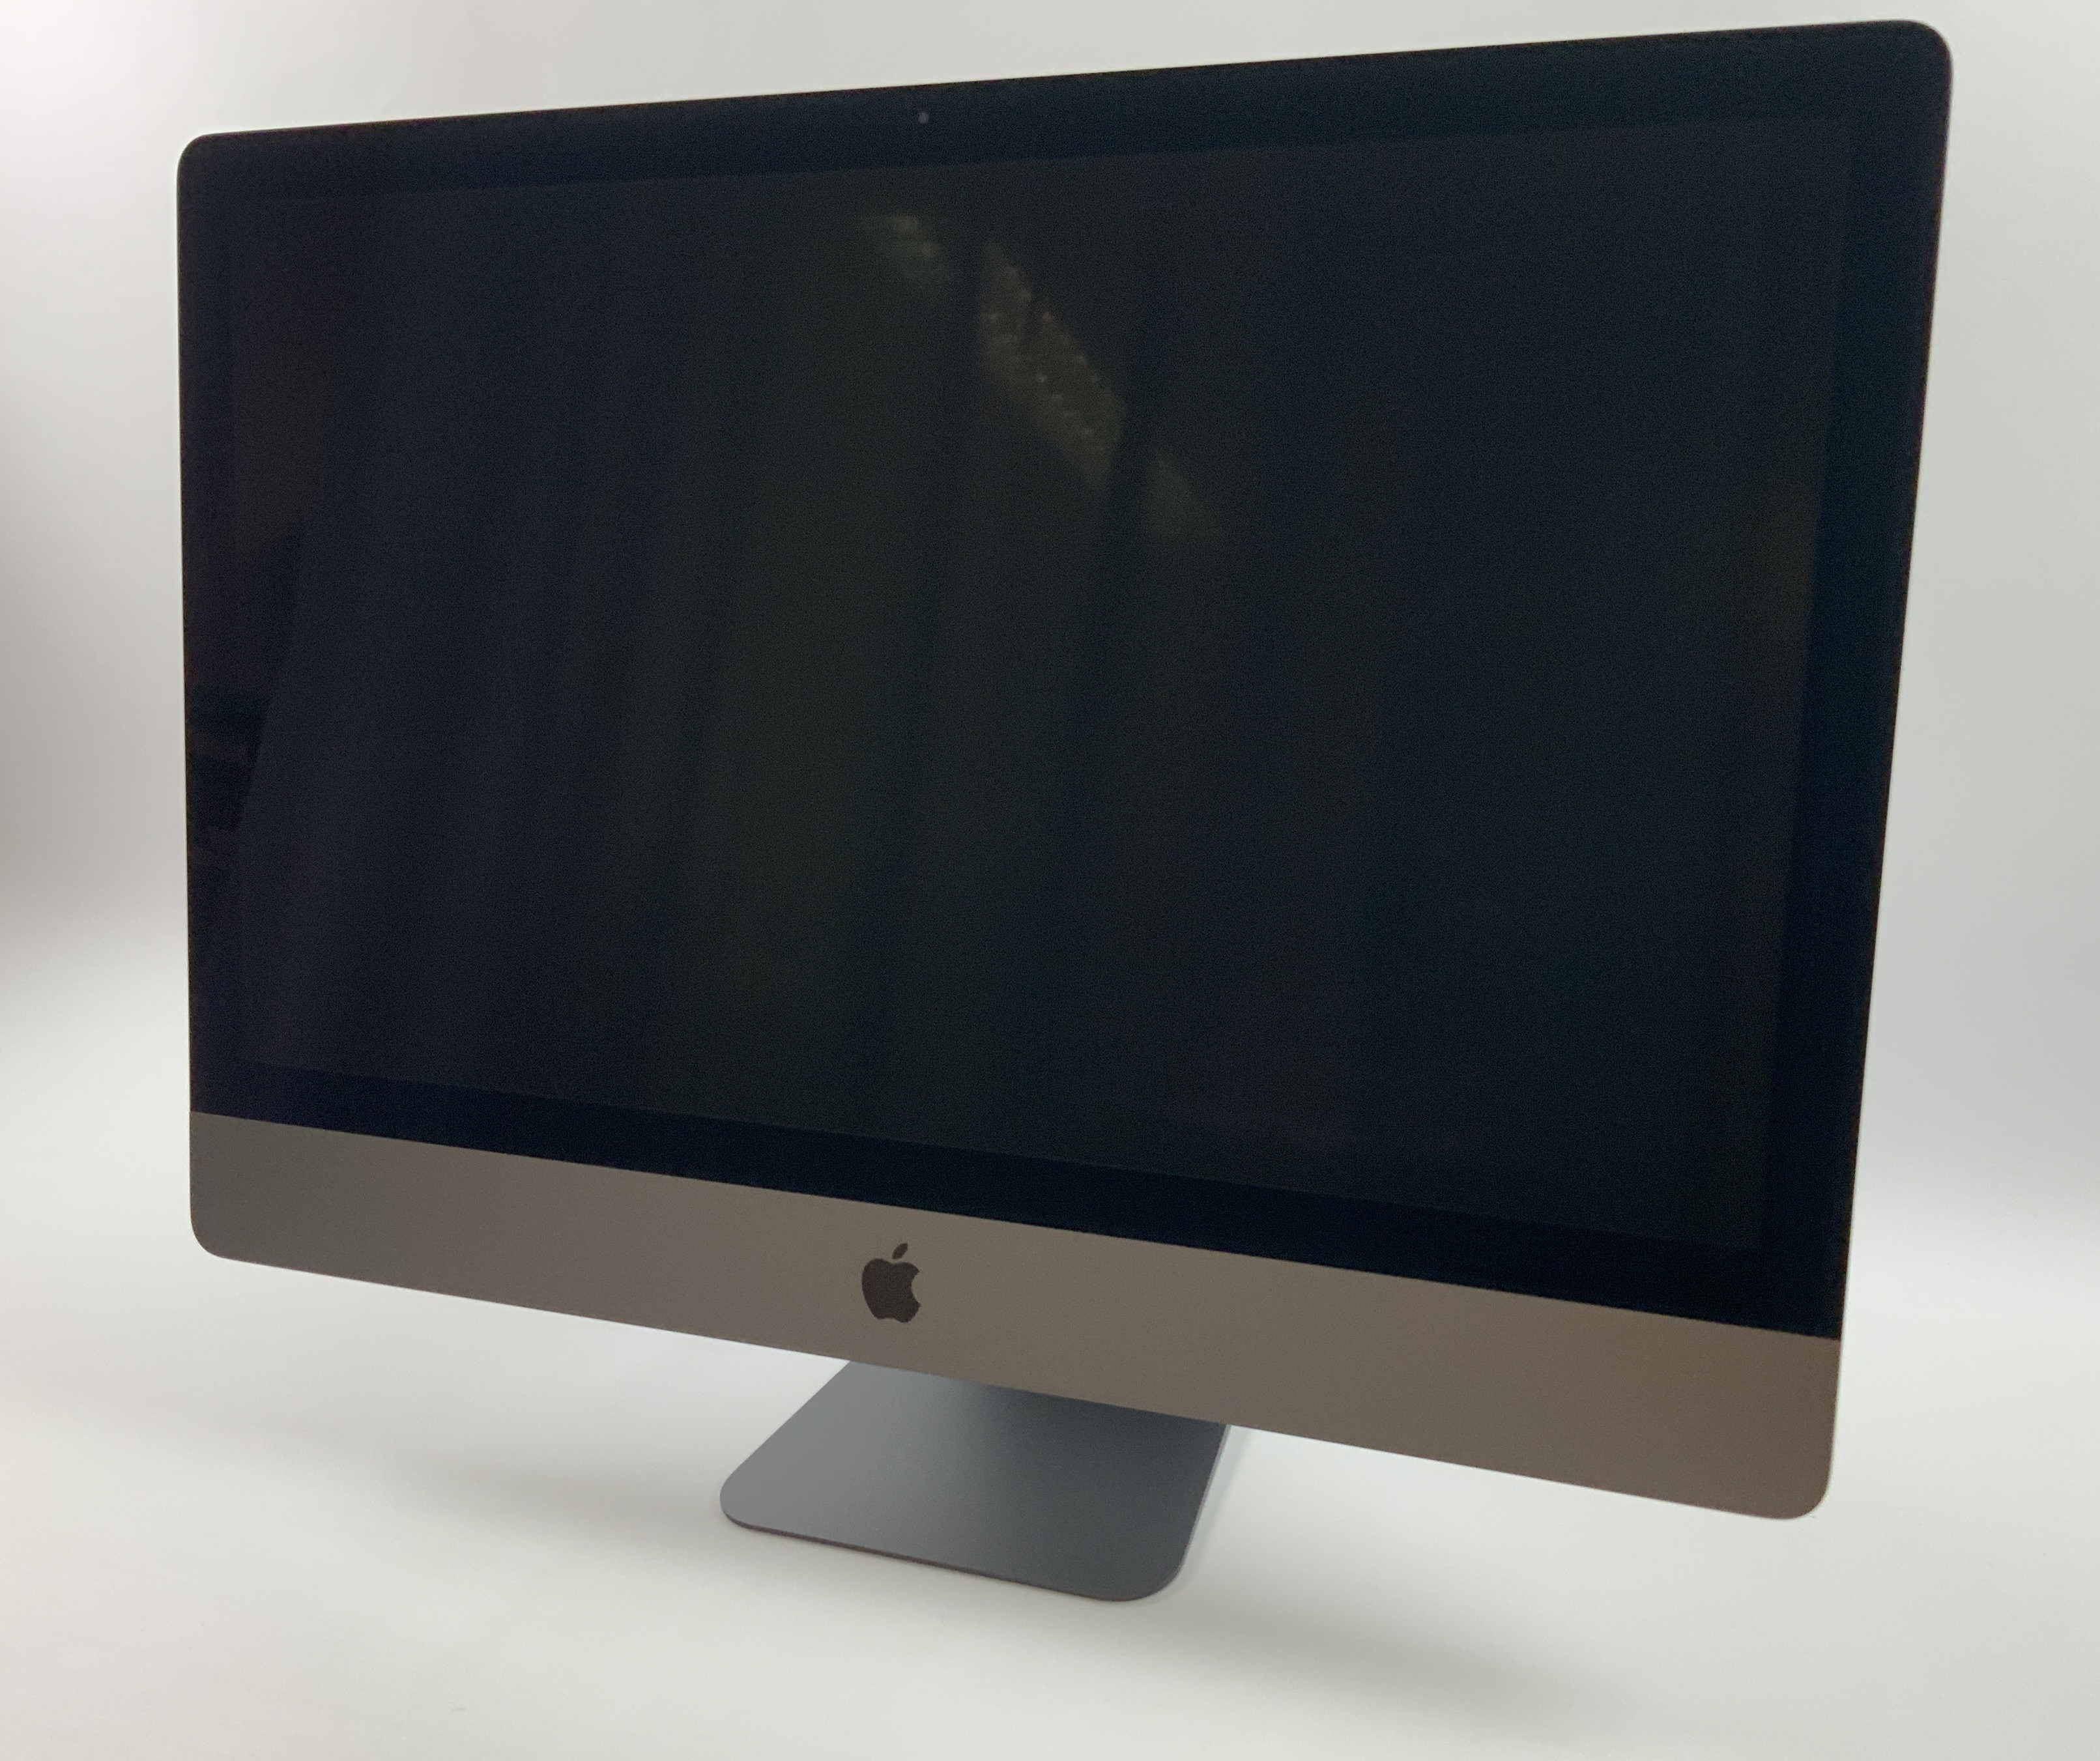 iMac Pro 2017 (Intel 18-Core Xeon W 2.3 GHz 128 GB RAM 1 TB SSD), Intel 18-Core Xeon W 2.3 GHz, 128 GB RAM, 1 TB SSD, Bild 1